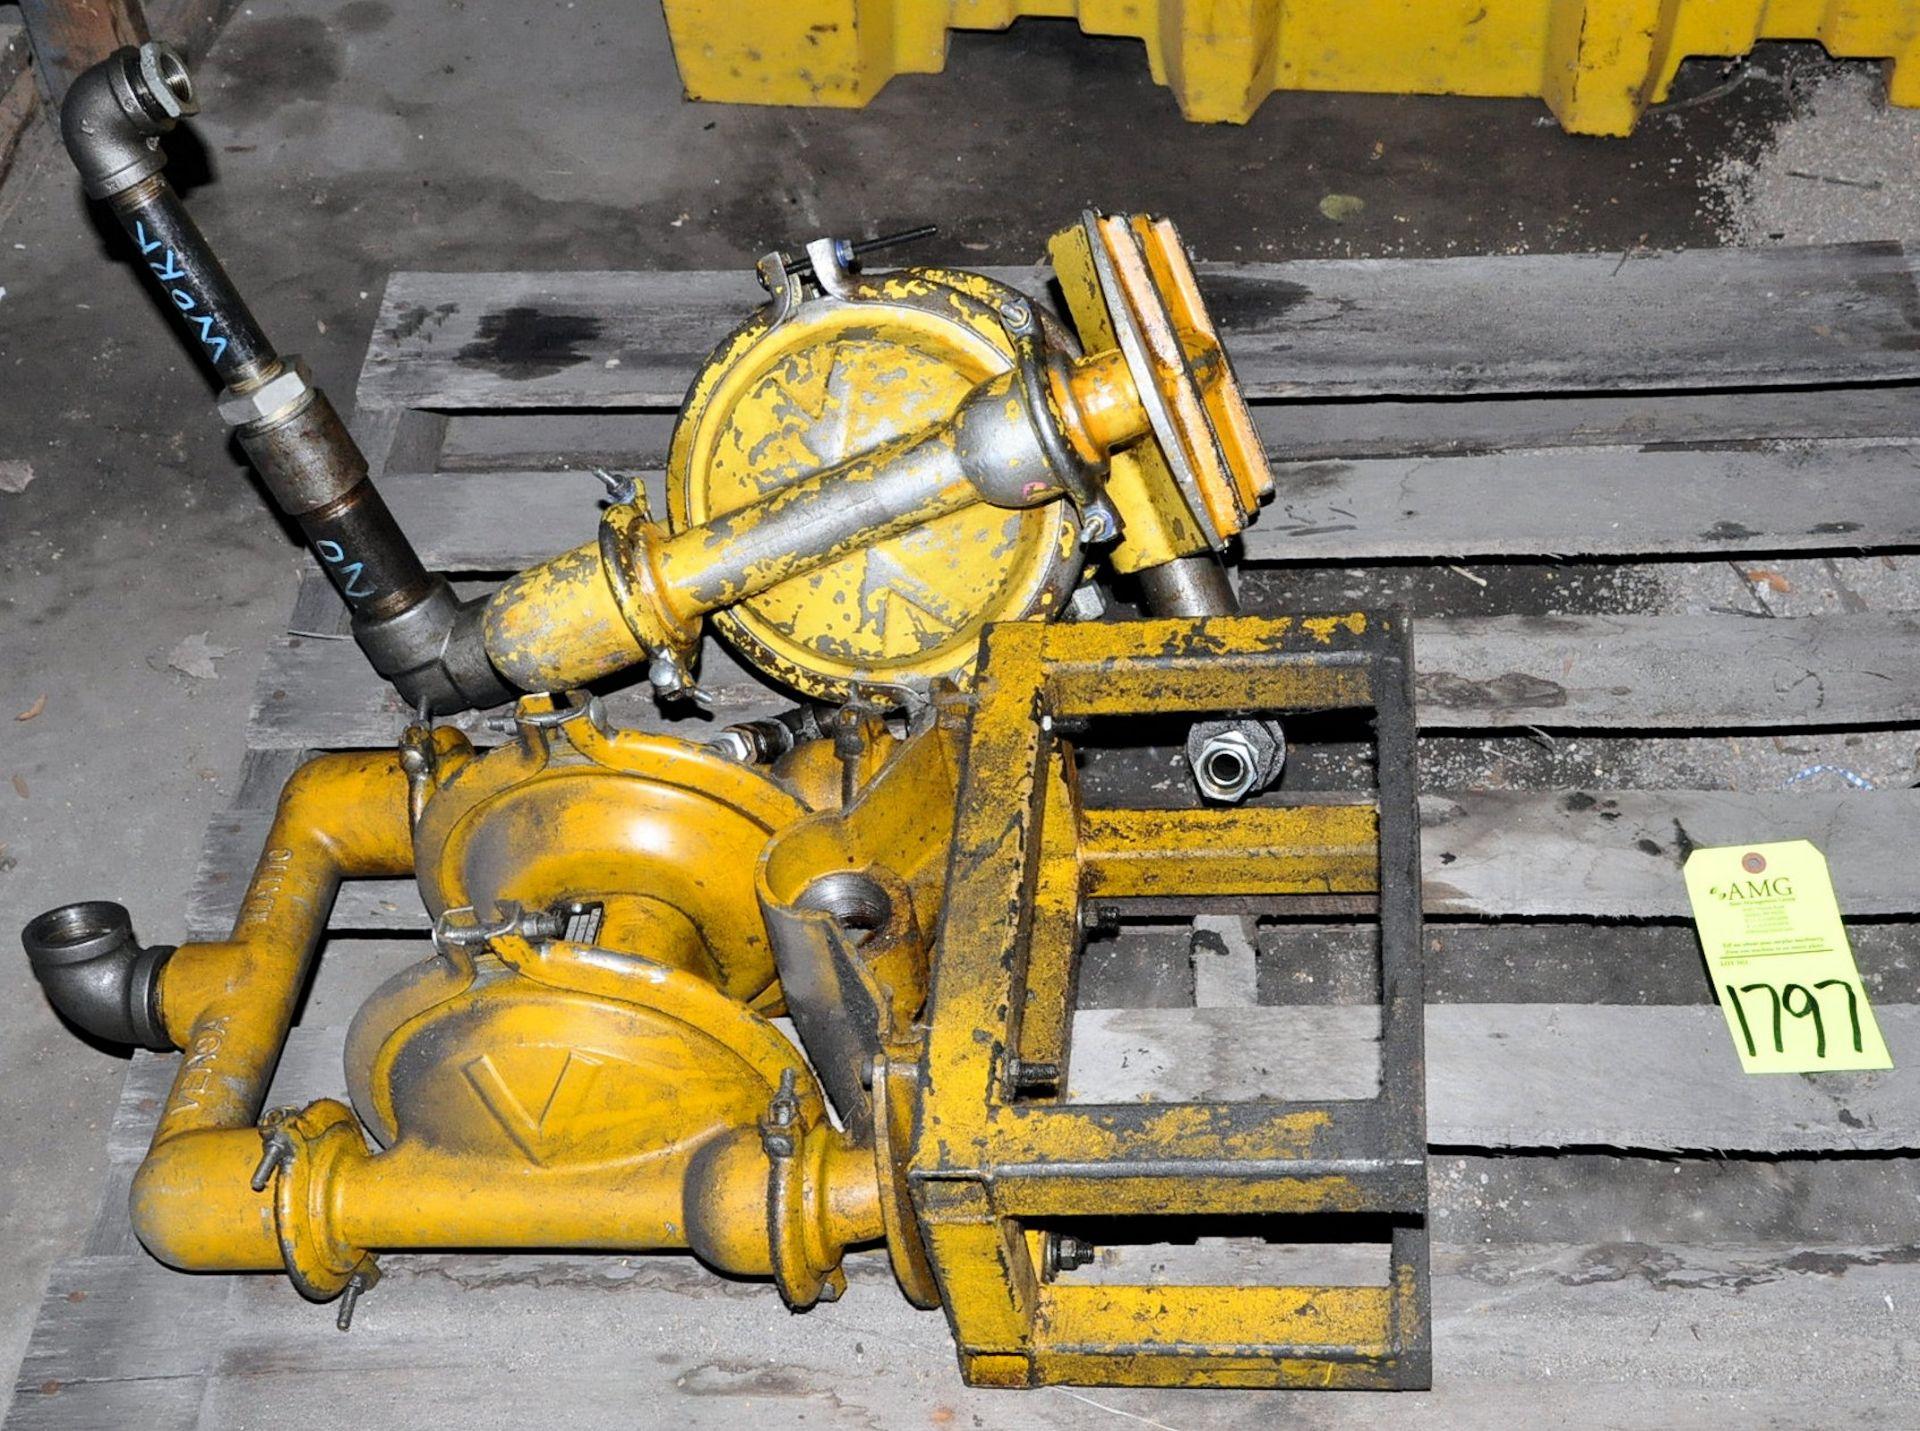 Lot-(3) Versamatic Pneumatic Fluids Pumps, (Oils Storage Building), (Yellow Tag) - Image 2 of 2